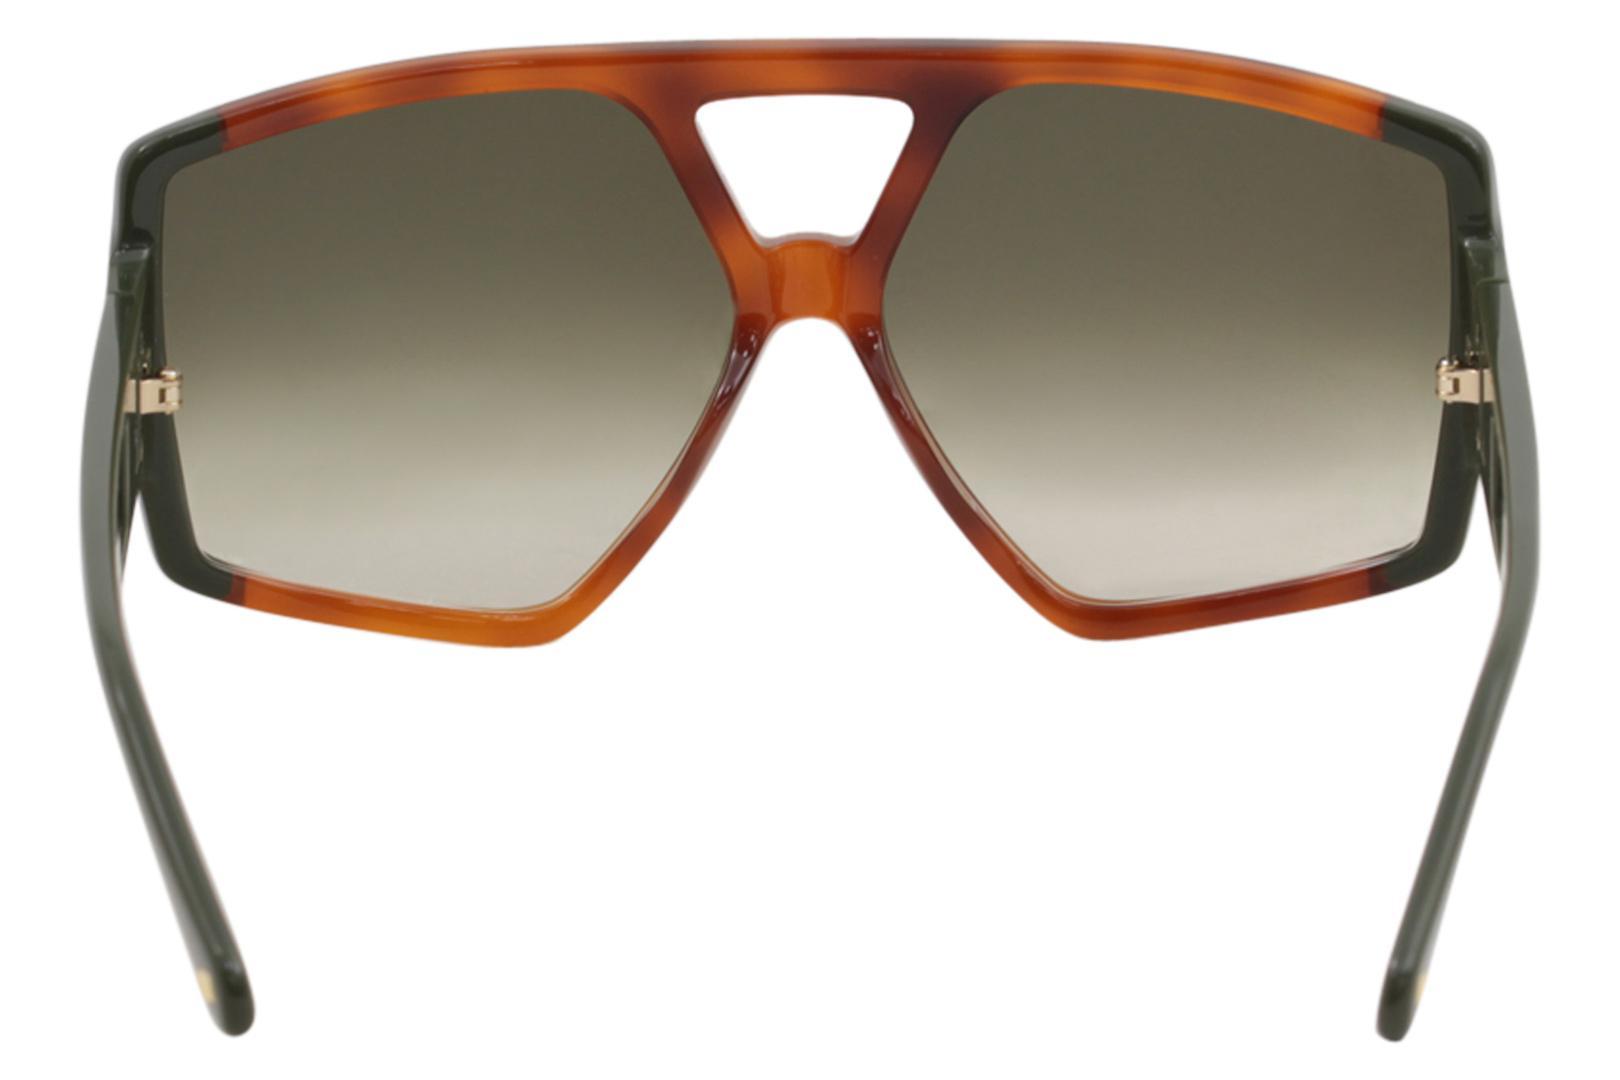 75facfe27e MCM Women s Sunglasses MCM671S MCM 671 S Fashion Square Sunglasses